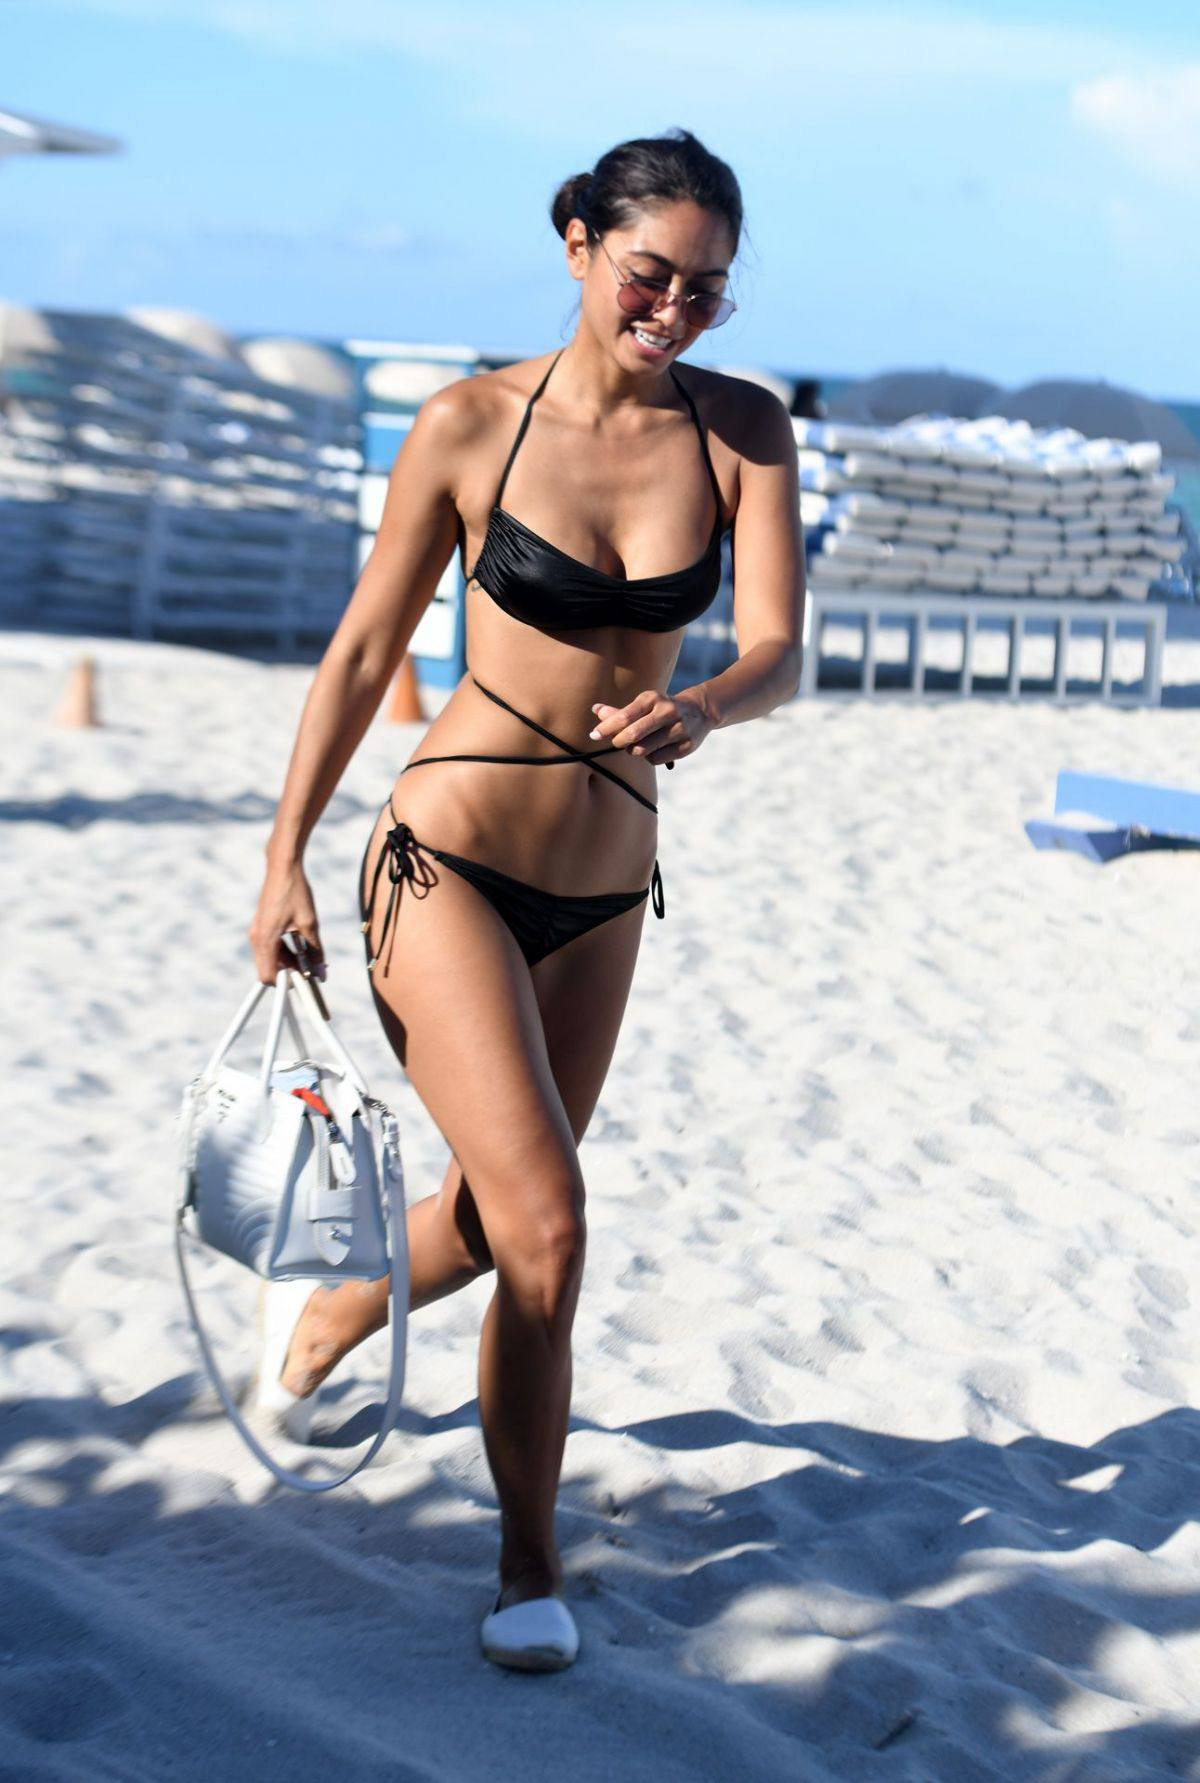 Ambra Gutierrez – Beautiful Body In Small Bikini At The Beach In Miami Beach 0007